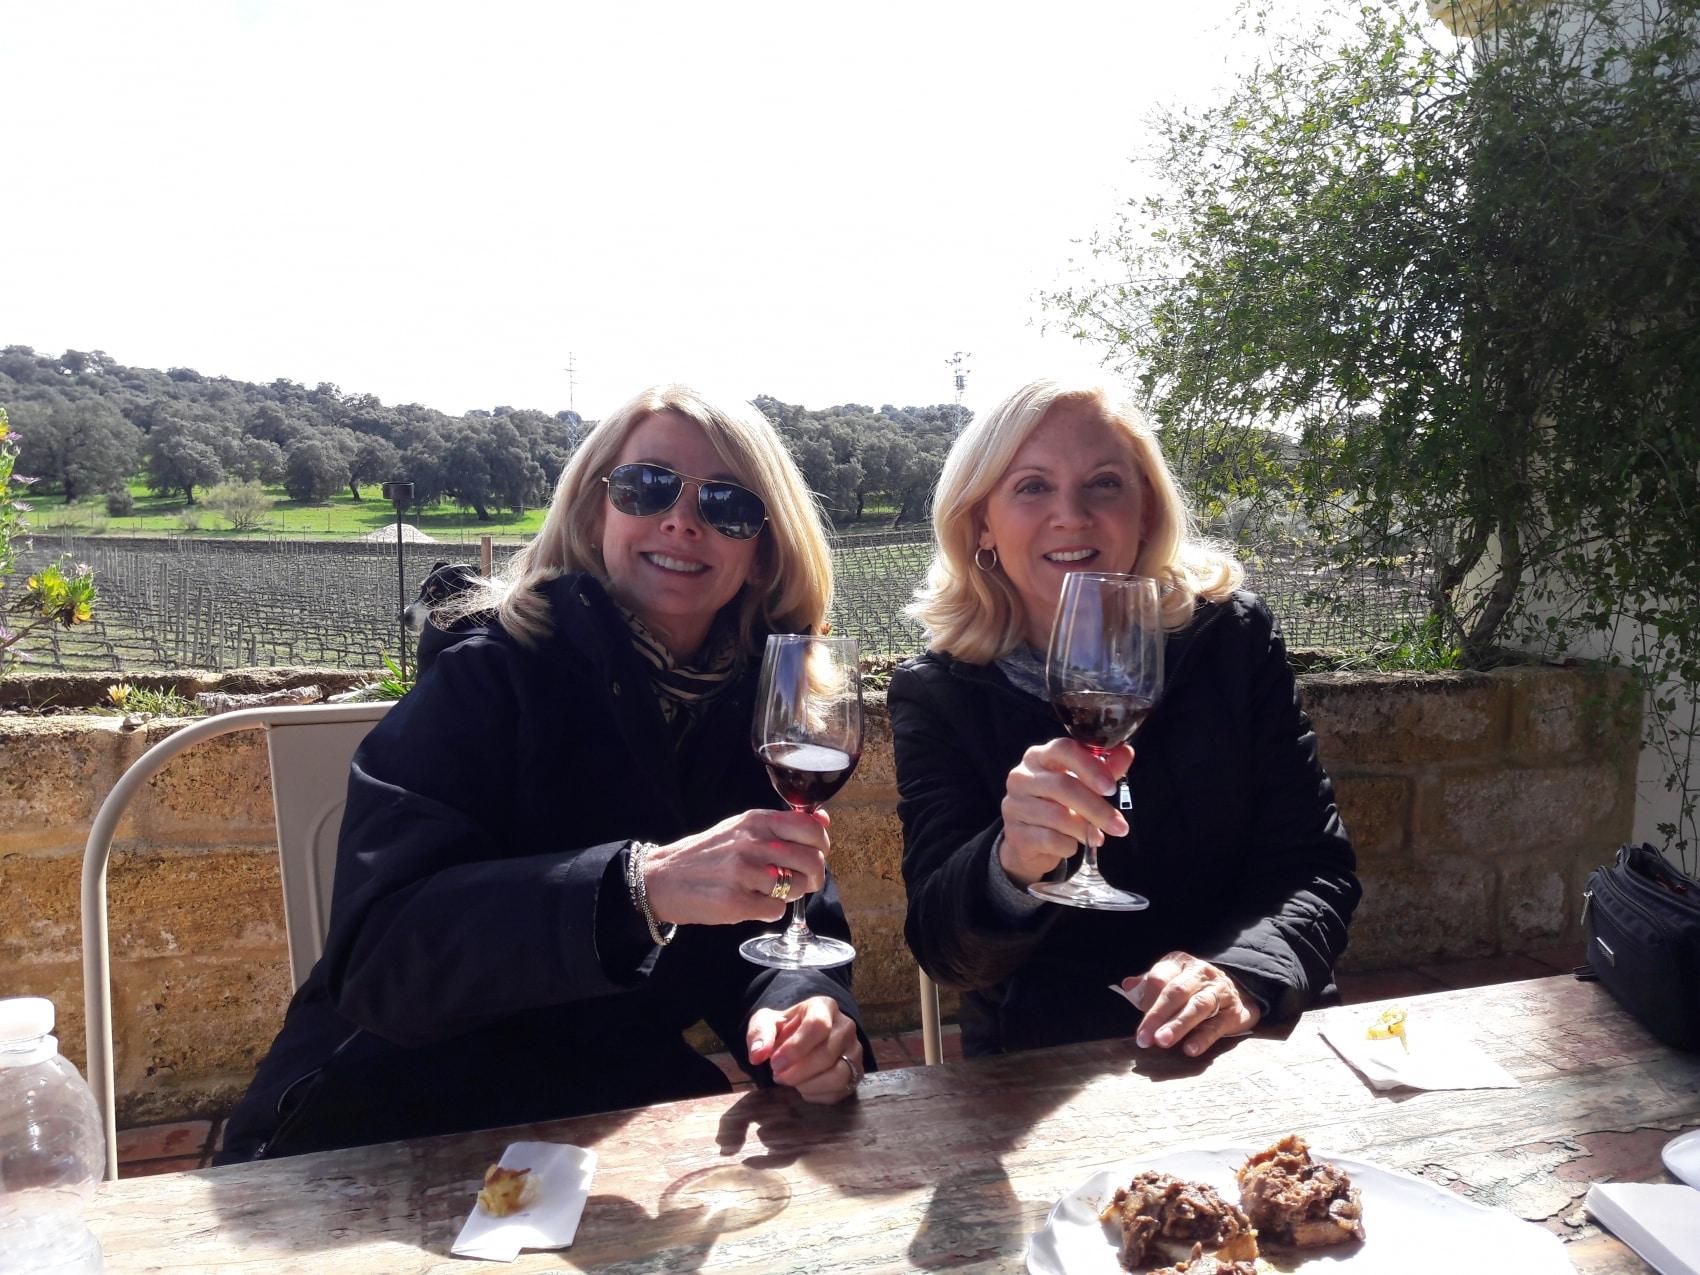 wine tasting at winery Ronda Spain